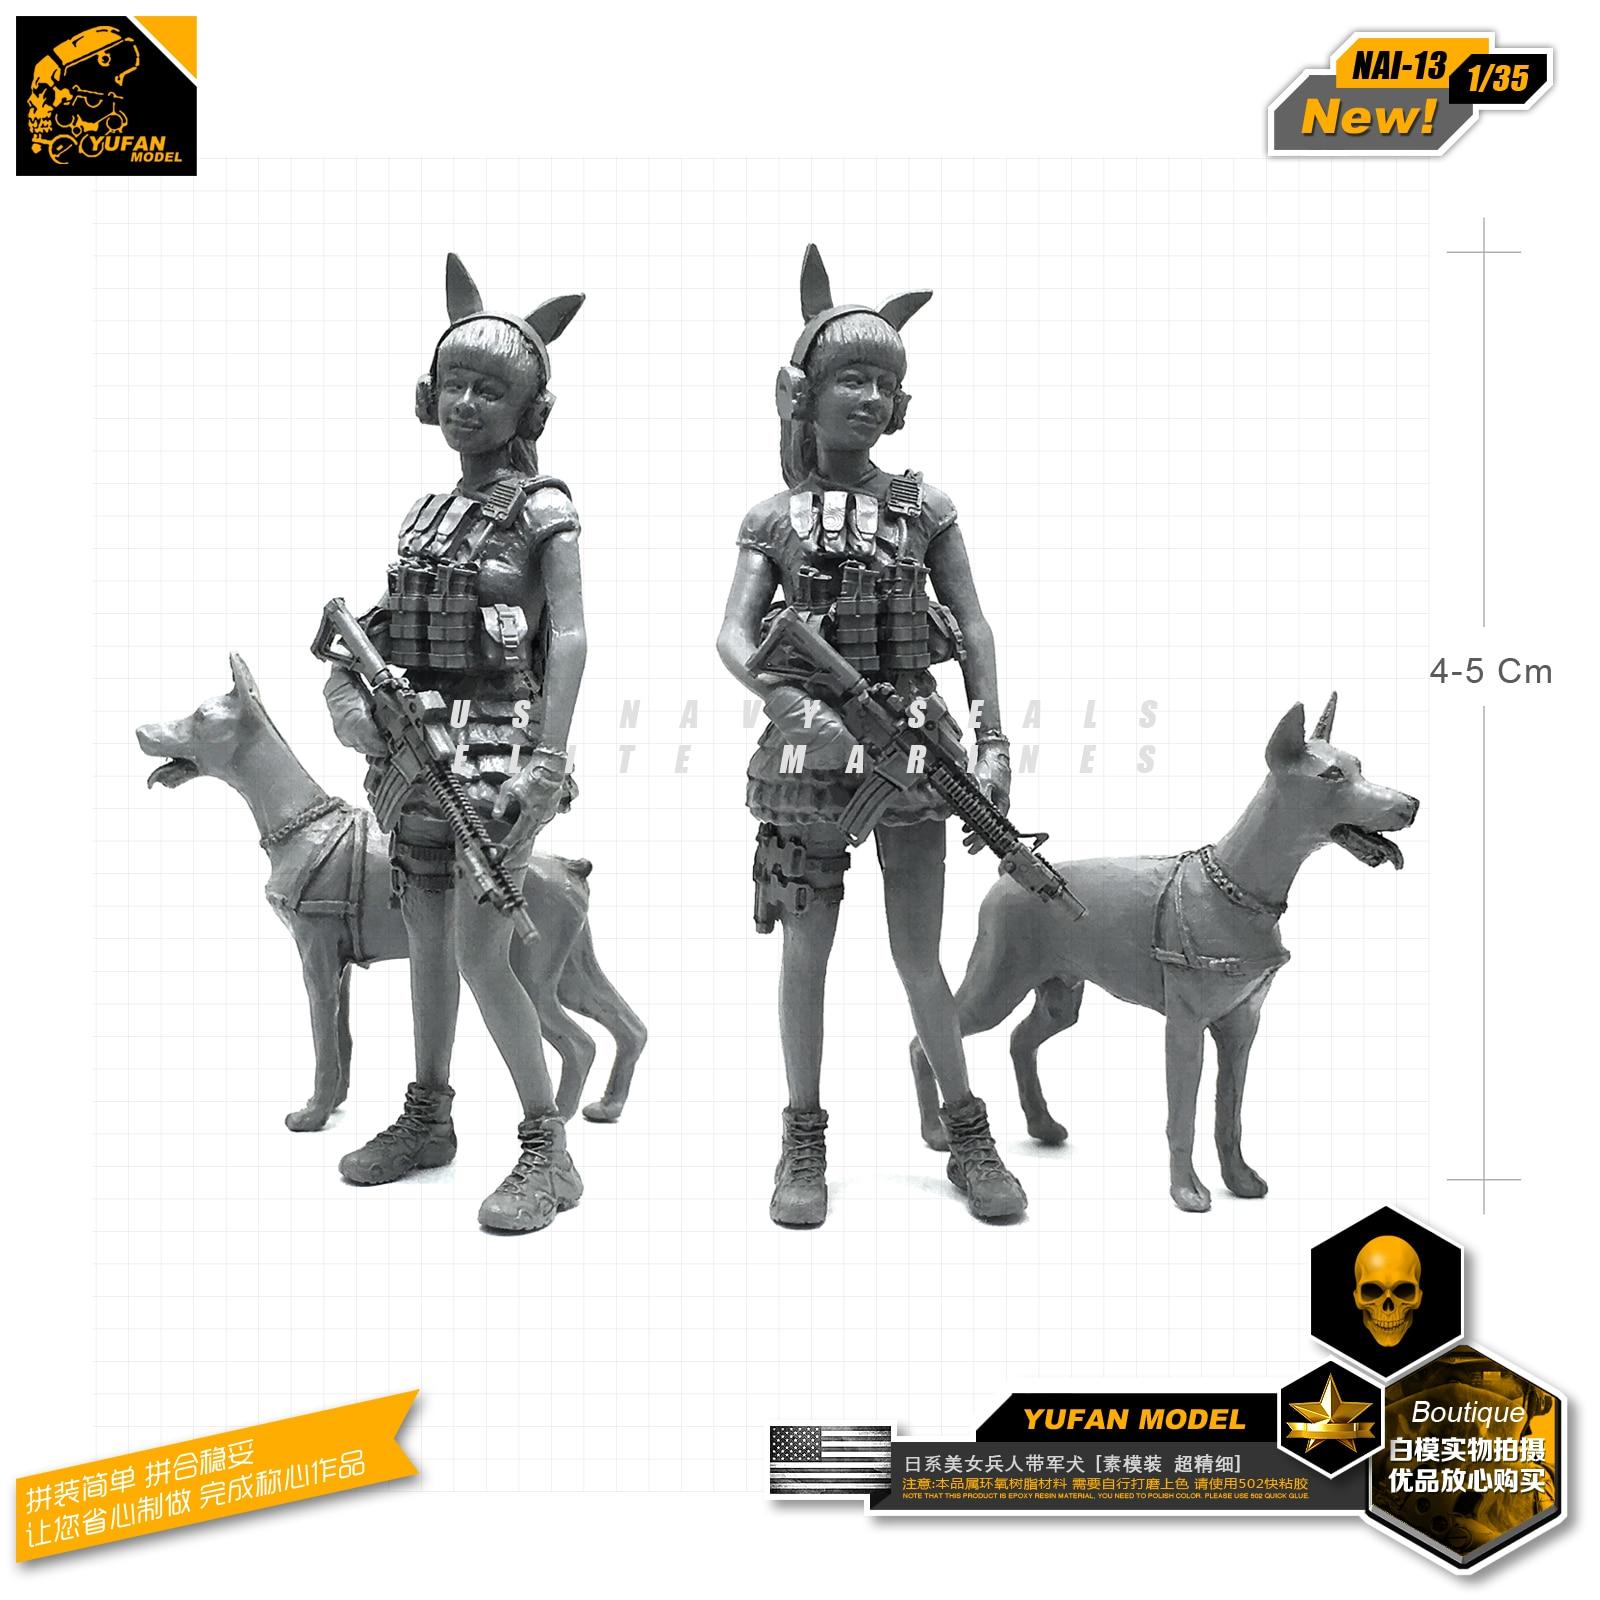 Yufan Model 1/35 Beauty Girls Figure And Dog Army Resin Soldier Model Kits Nai-13